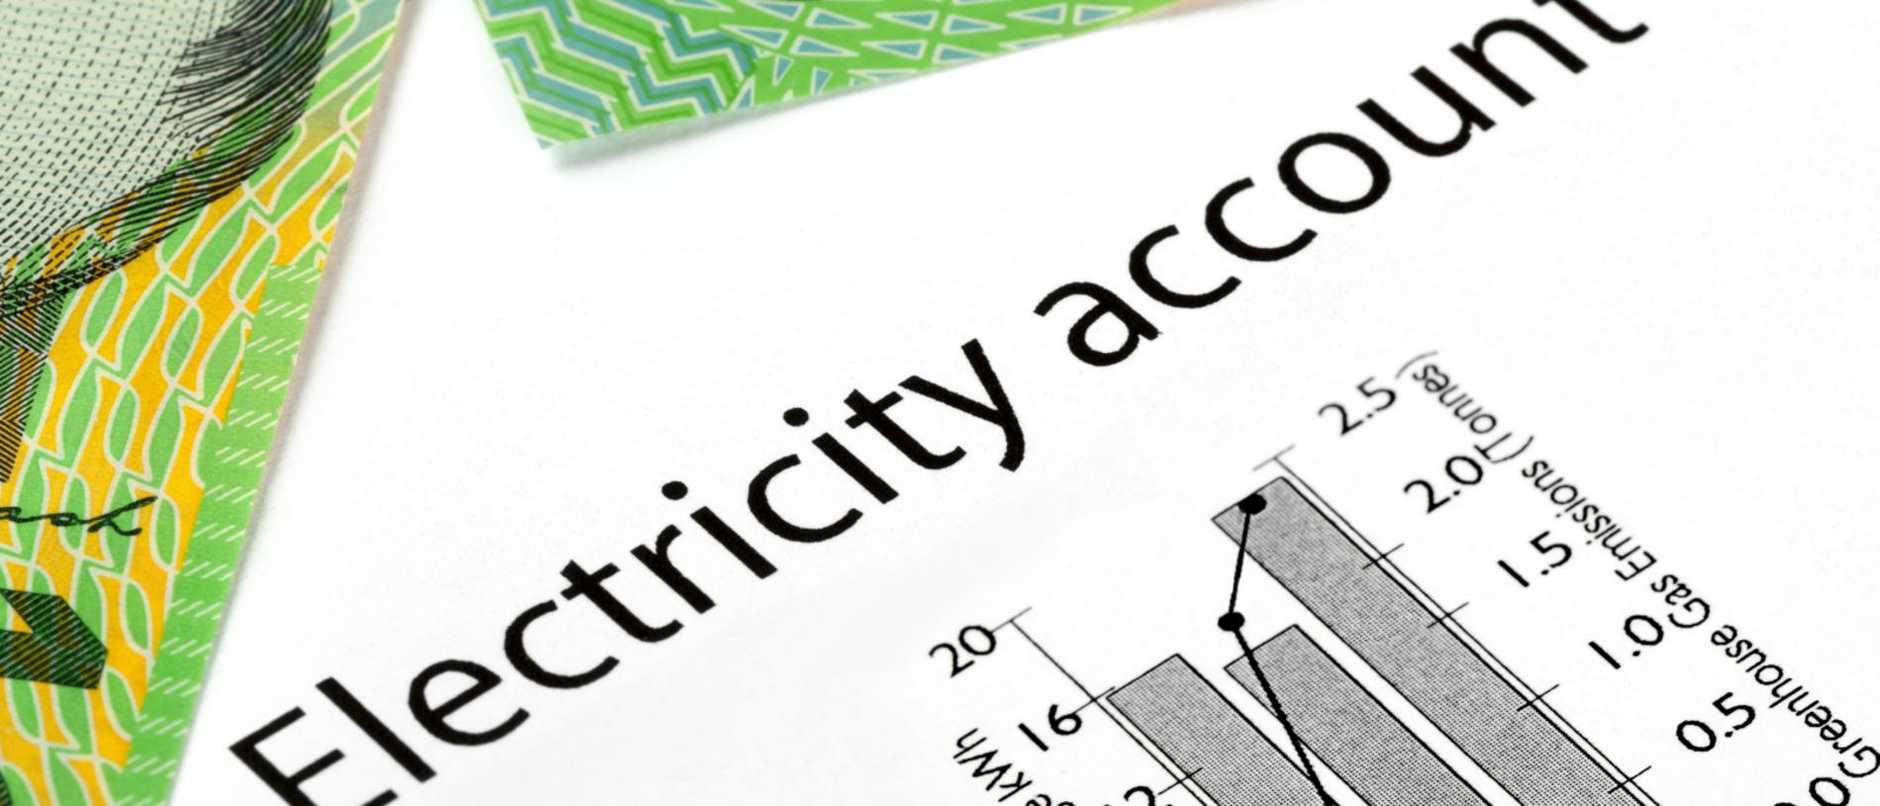 Supplied Money electricity account, moneysaverHQ